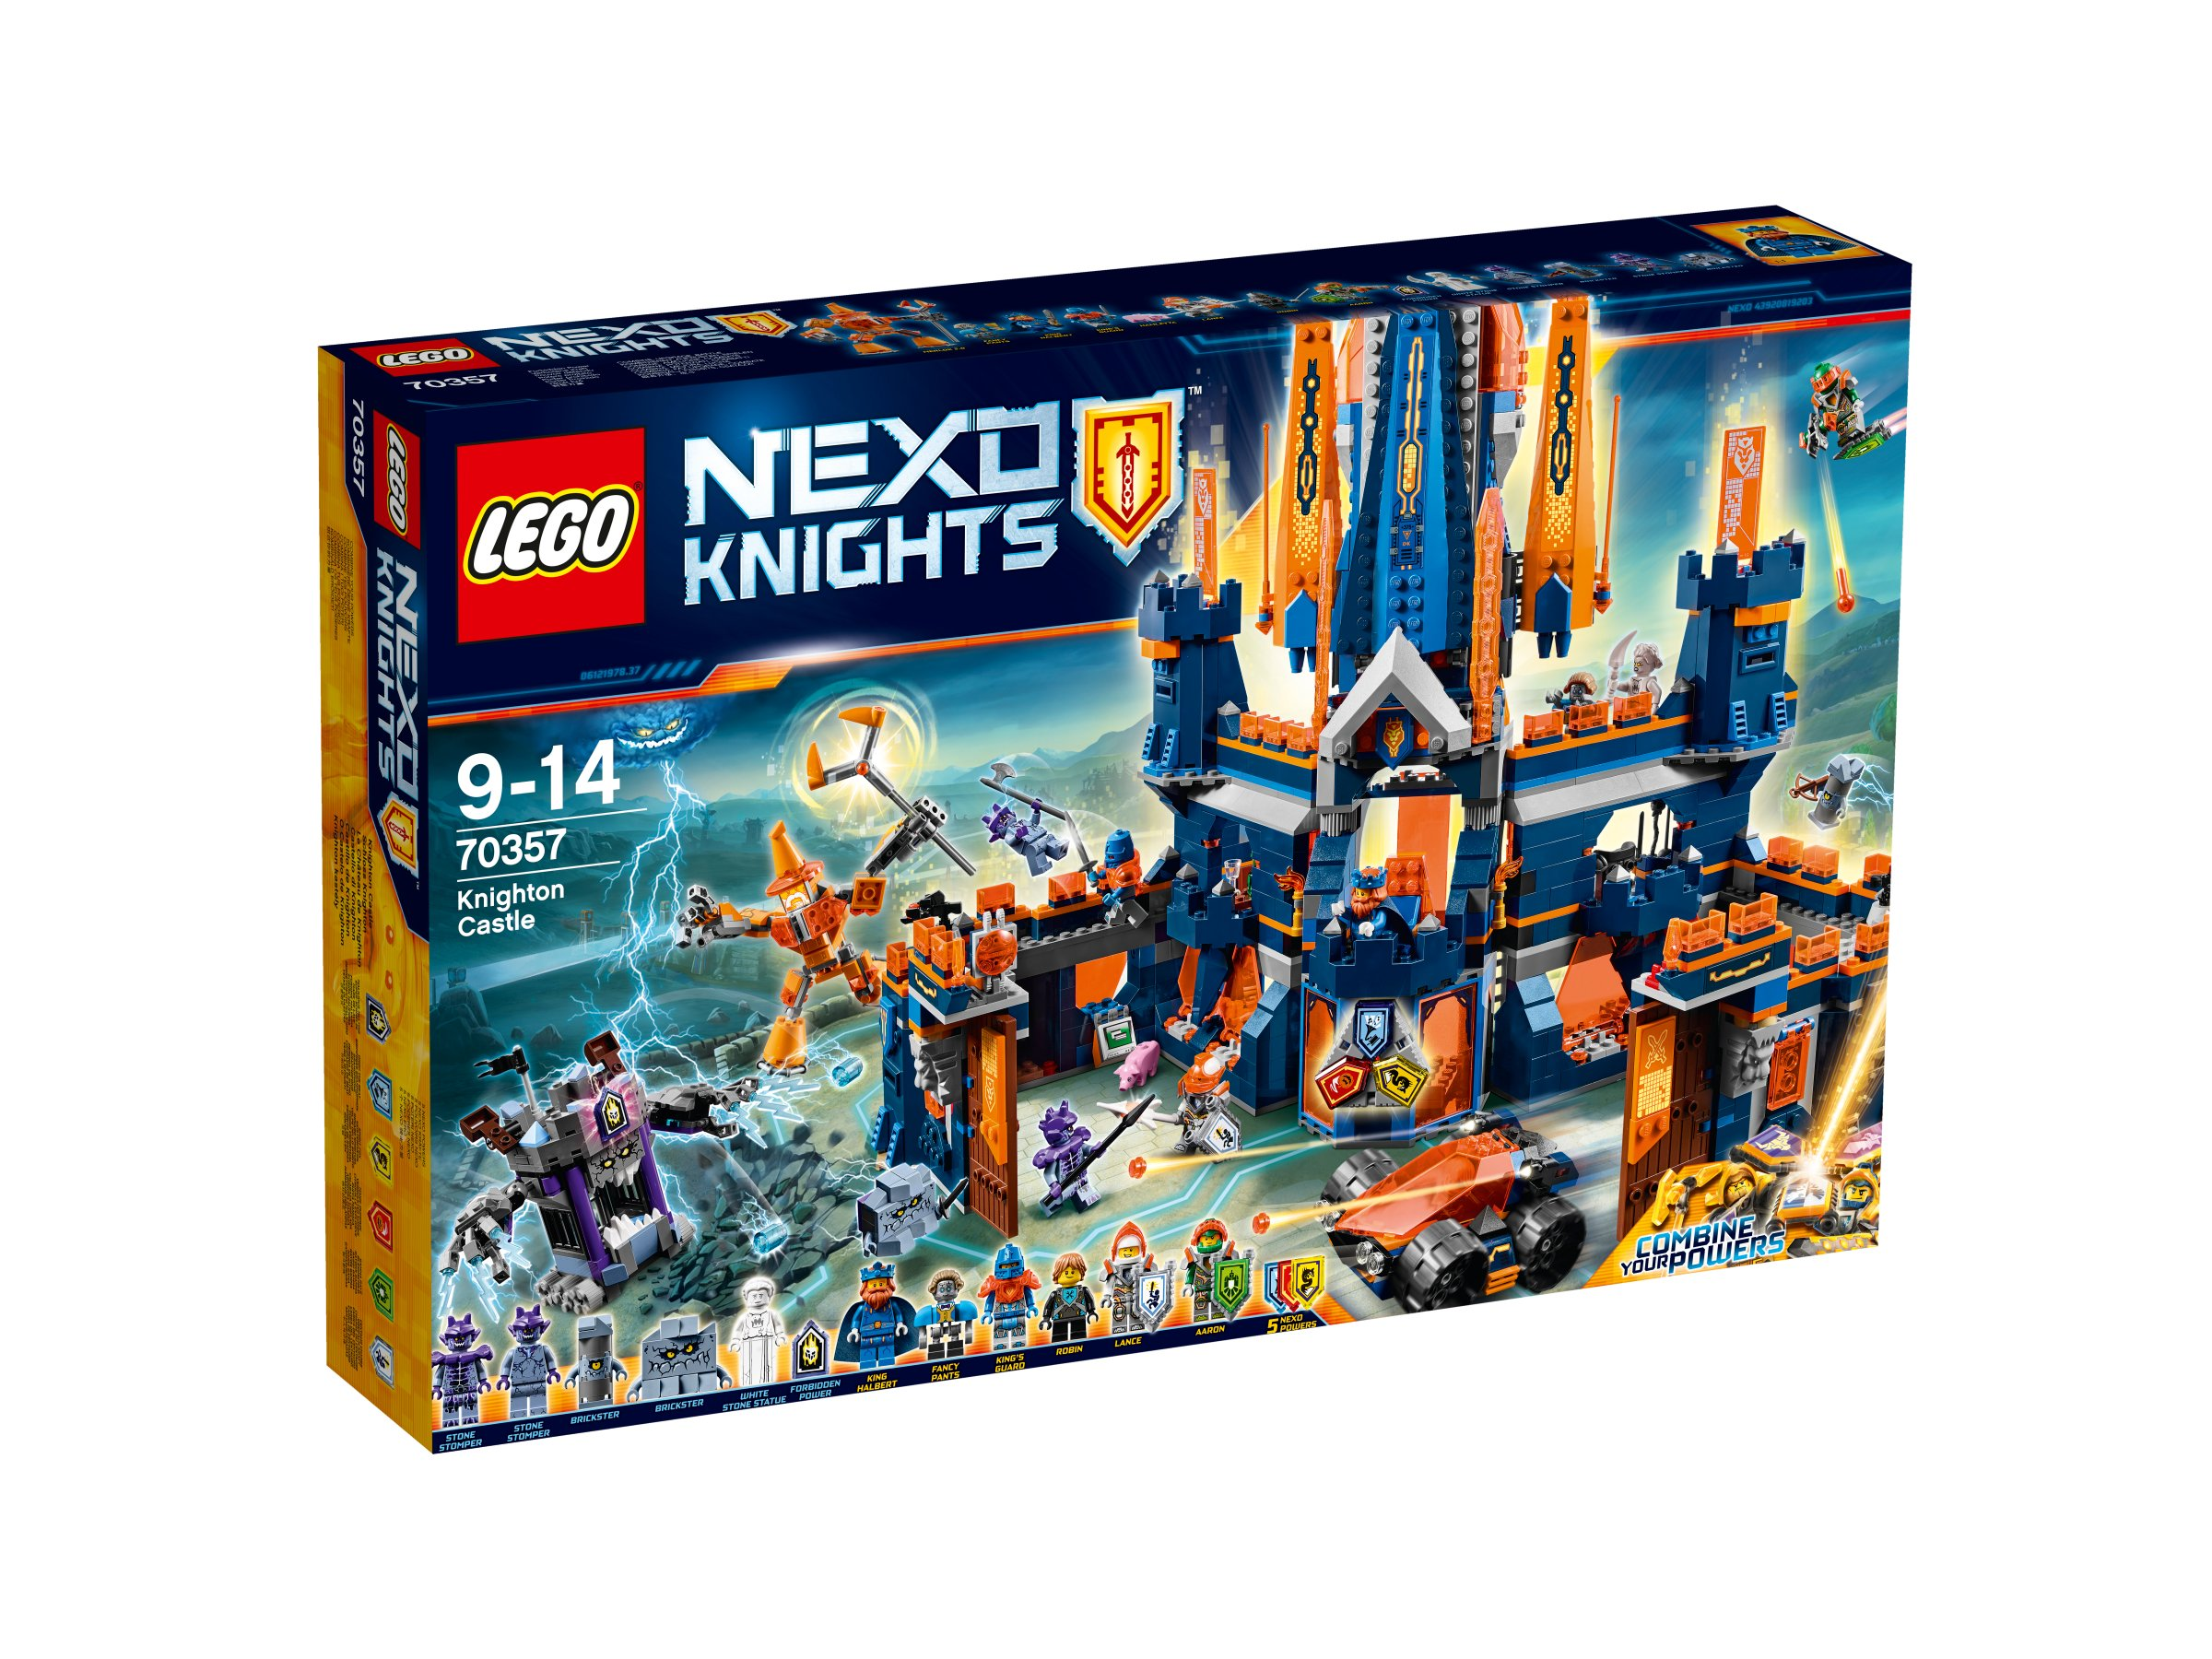 Lego Nexo Knights 70357 Zamek Knighton Promocja 7152066857